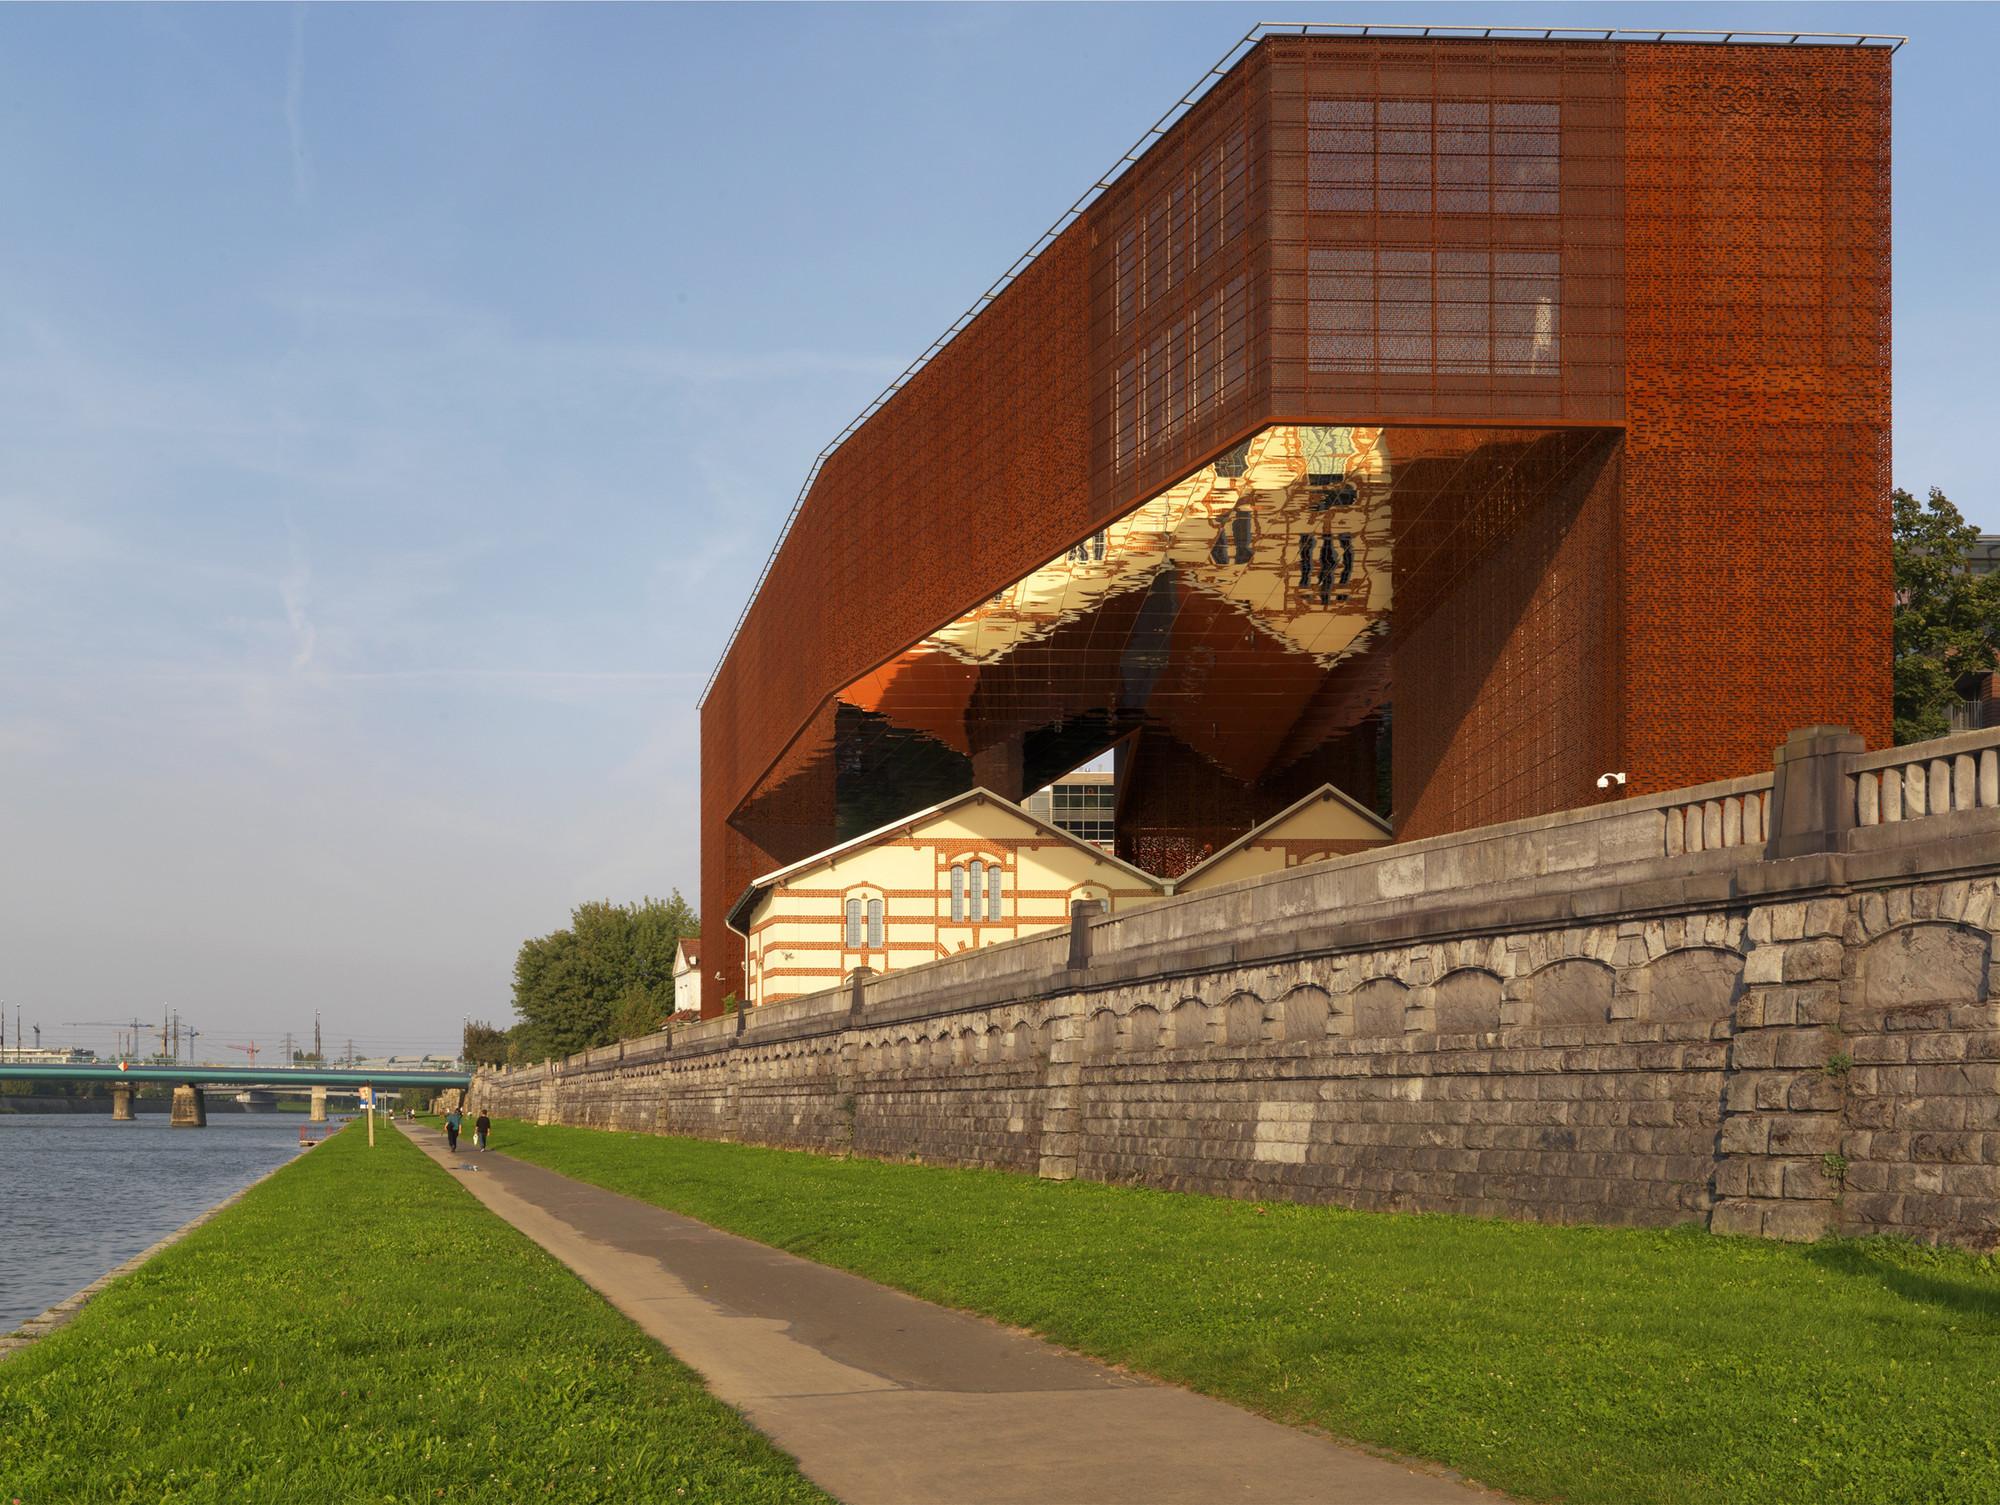 CRICOTEKA Museum of Tadeusz Kantor / Wizja + nsMoonStudio, © Wojciech Kryński